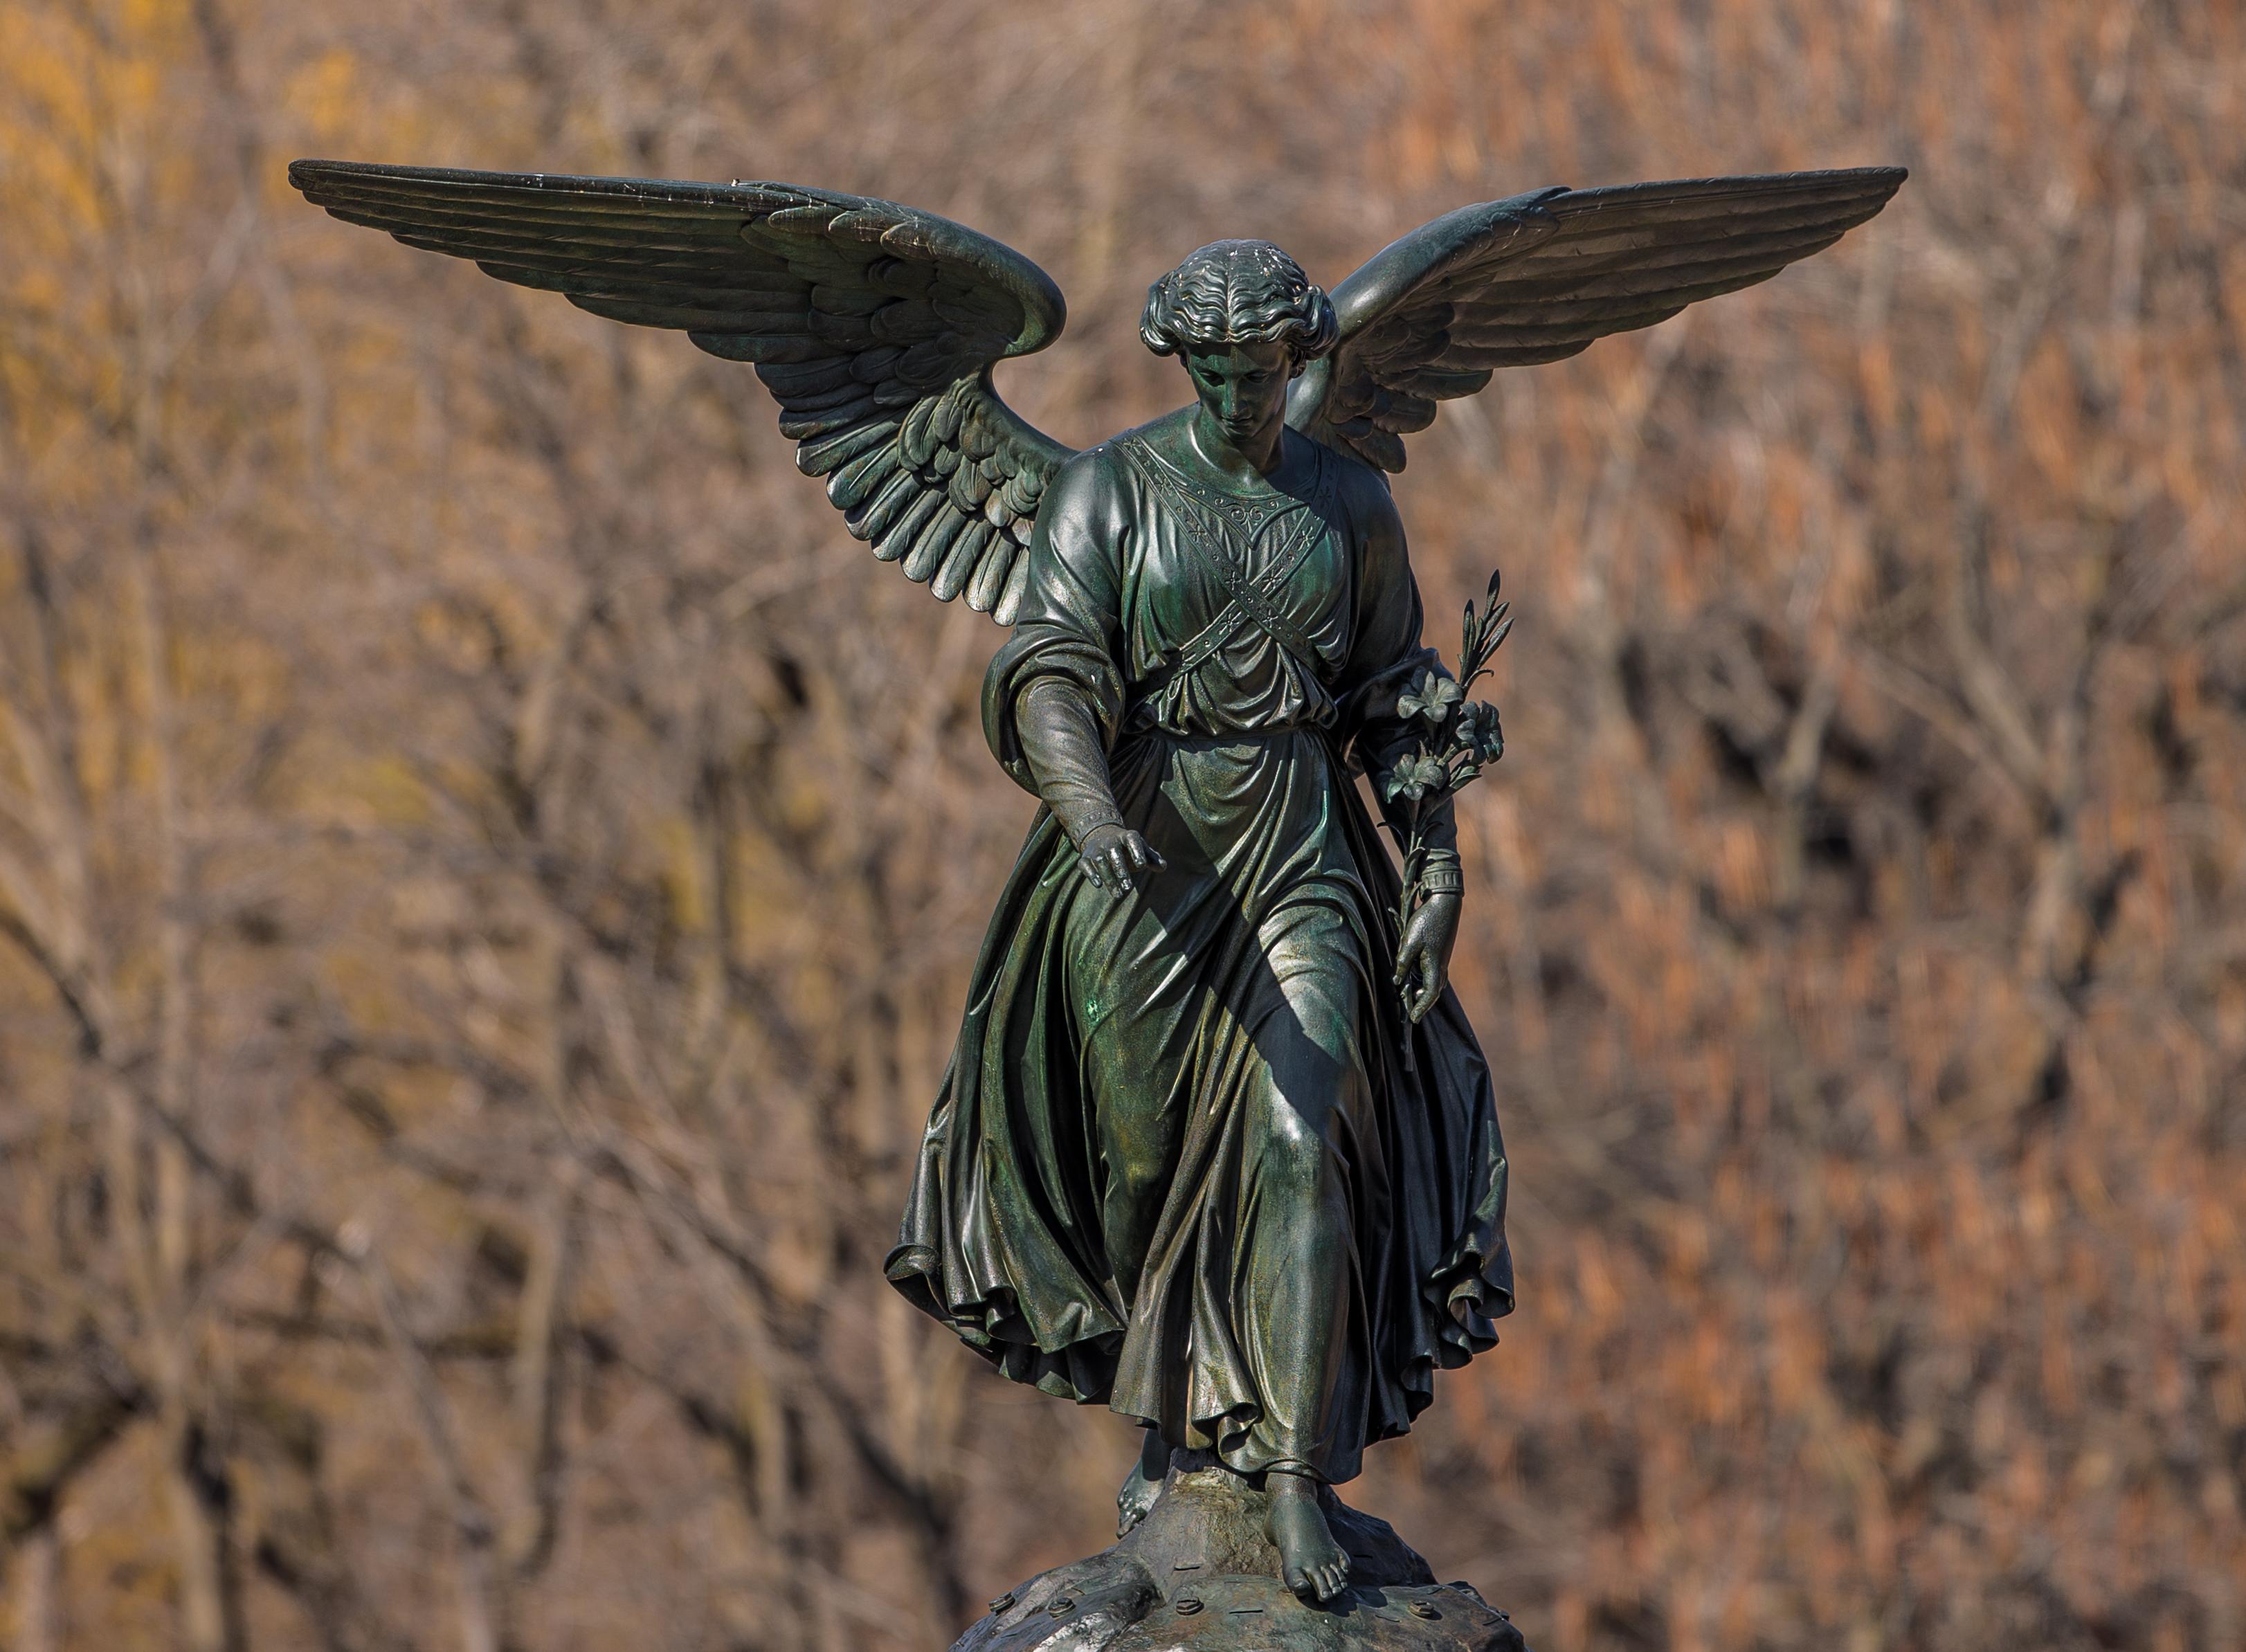 Bethesda Fountain NYC Central Park